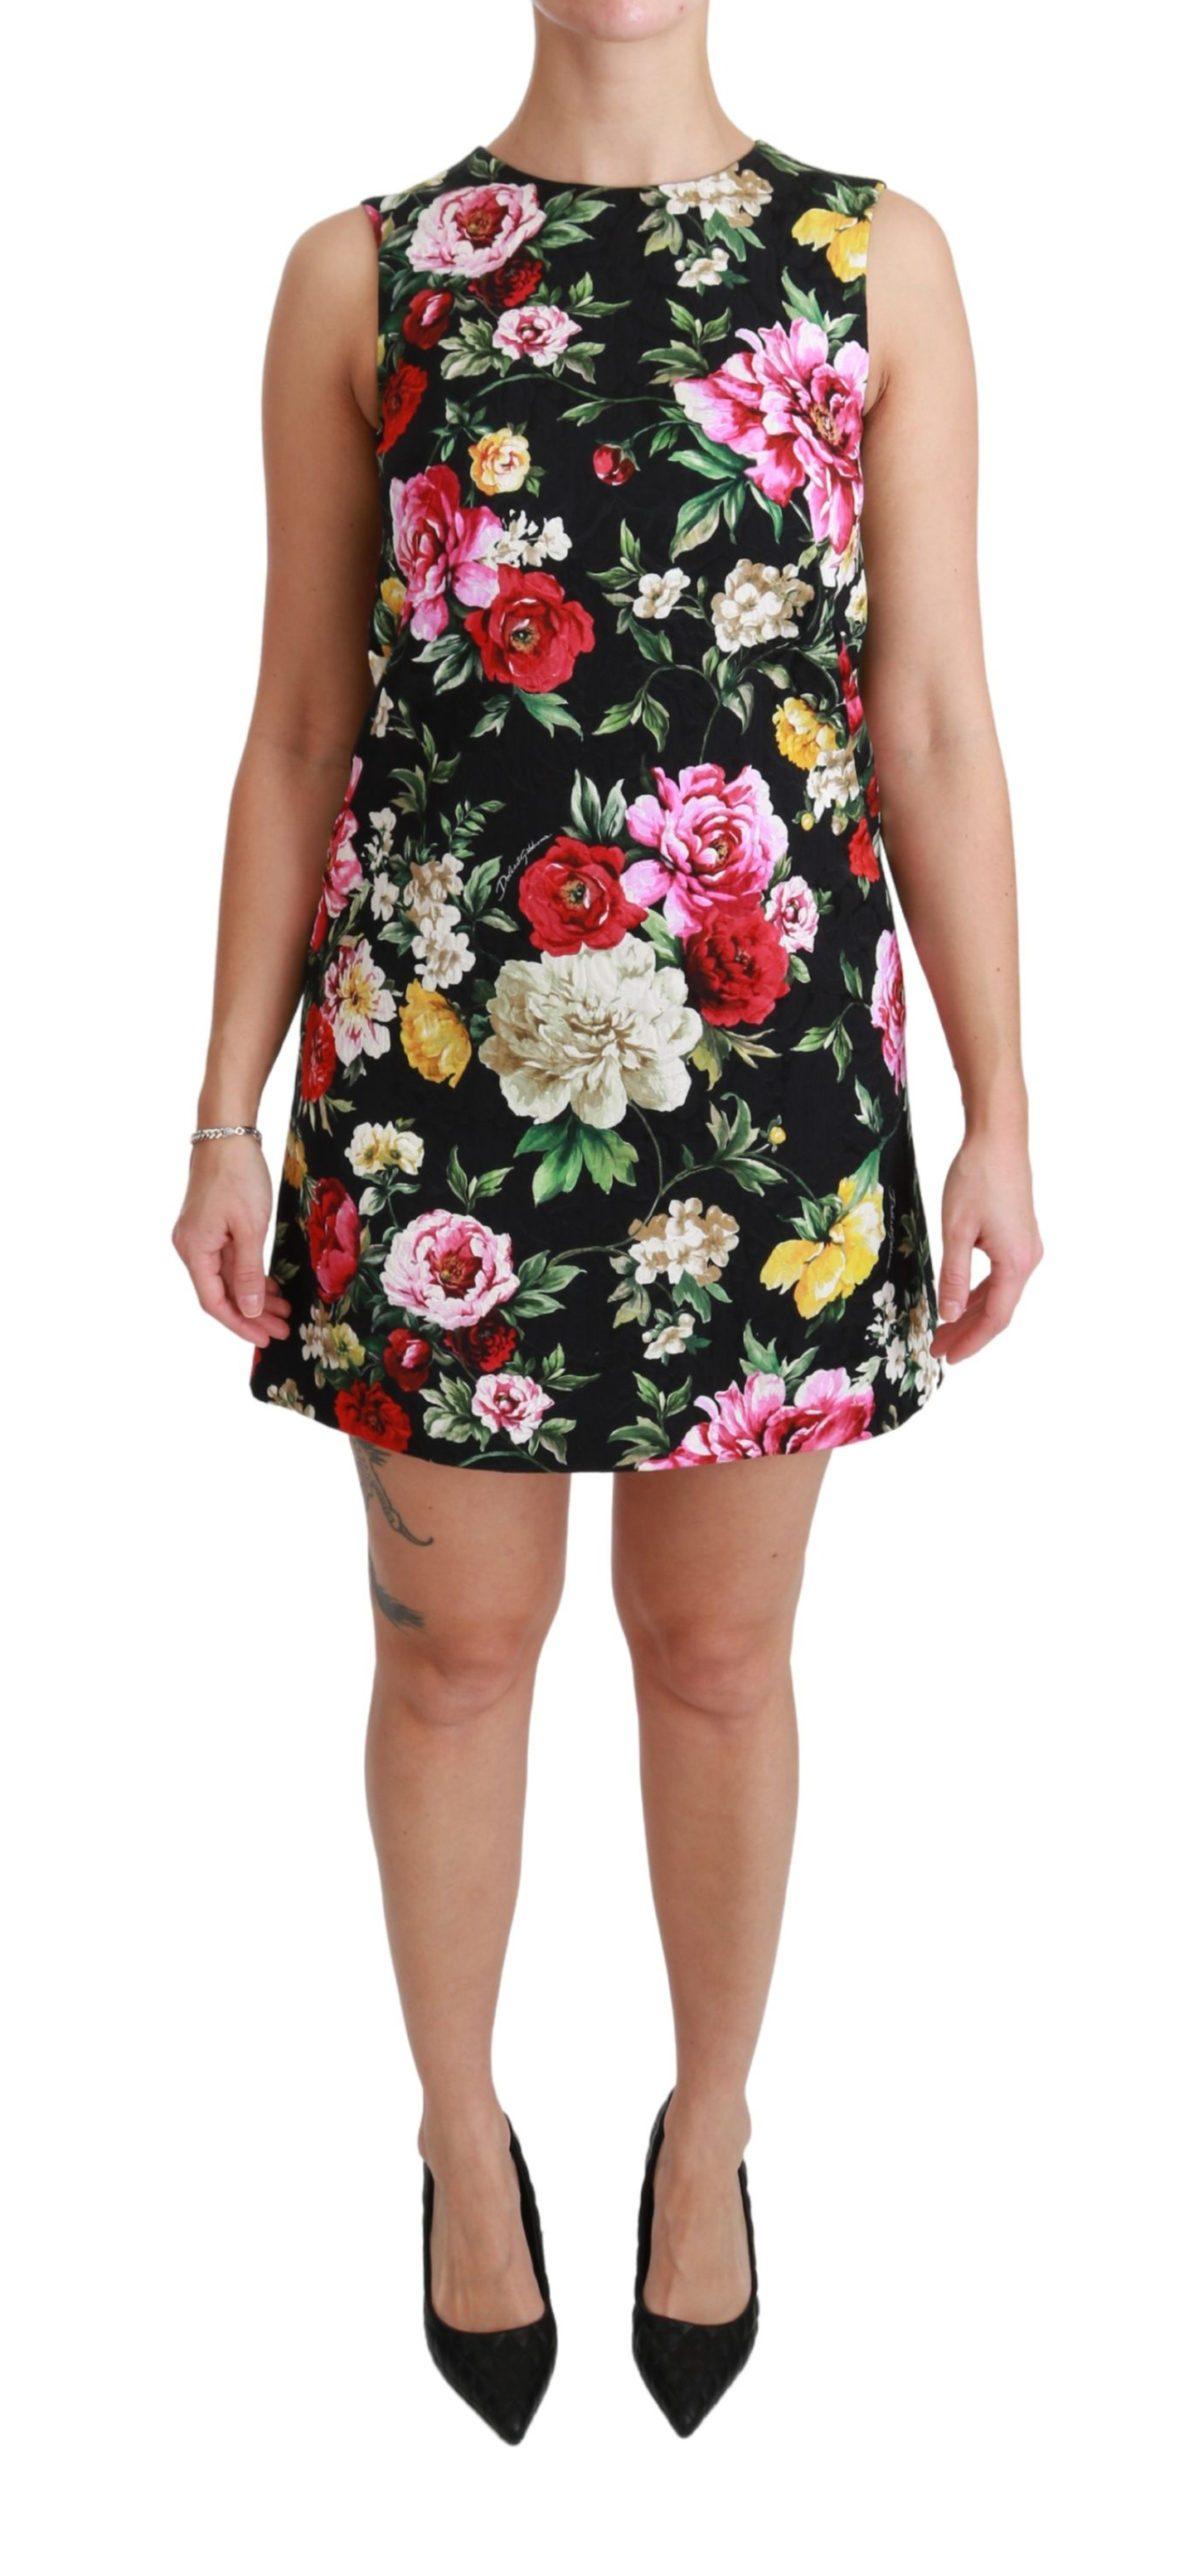 Dolce & Gabbana Women's Floral Brocade Mini Shift Dress Black DR2454 - IT38|XS